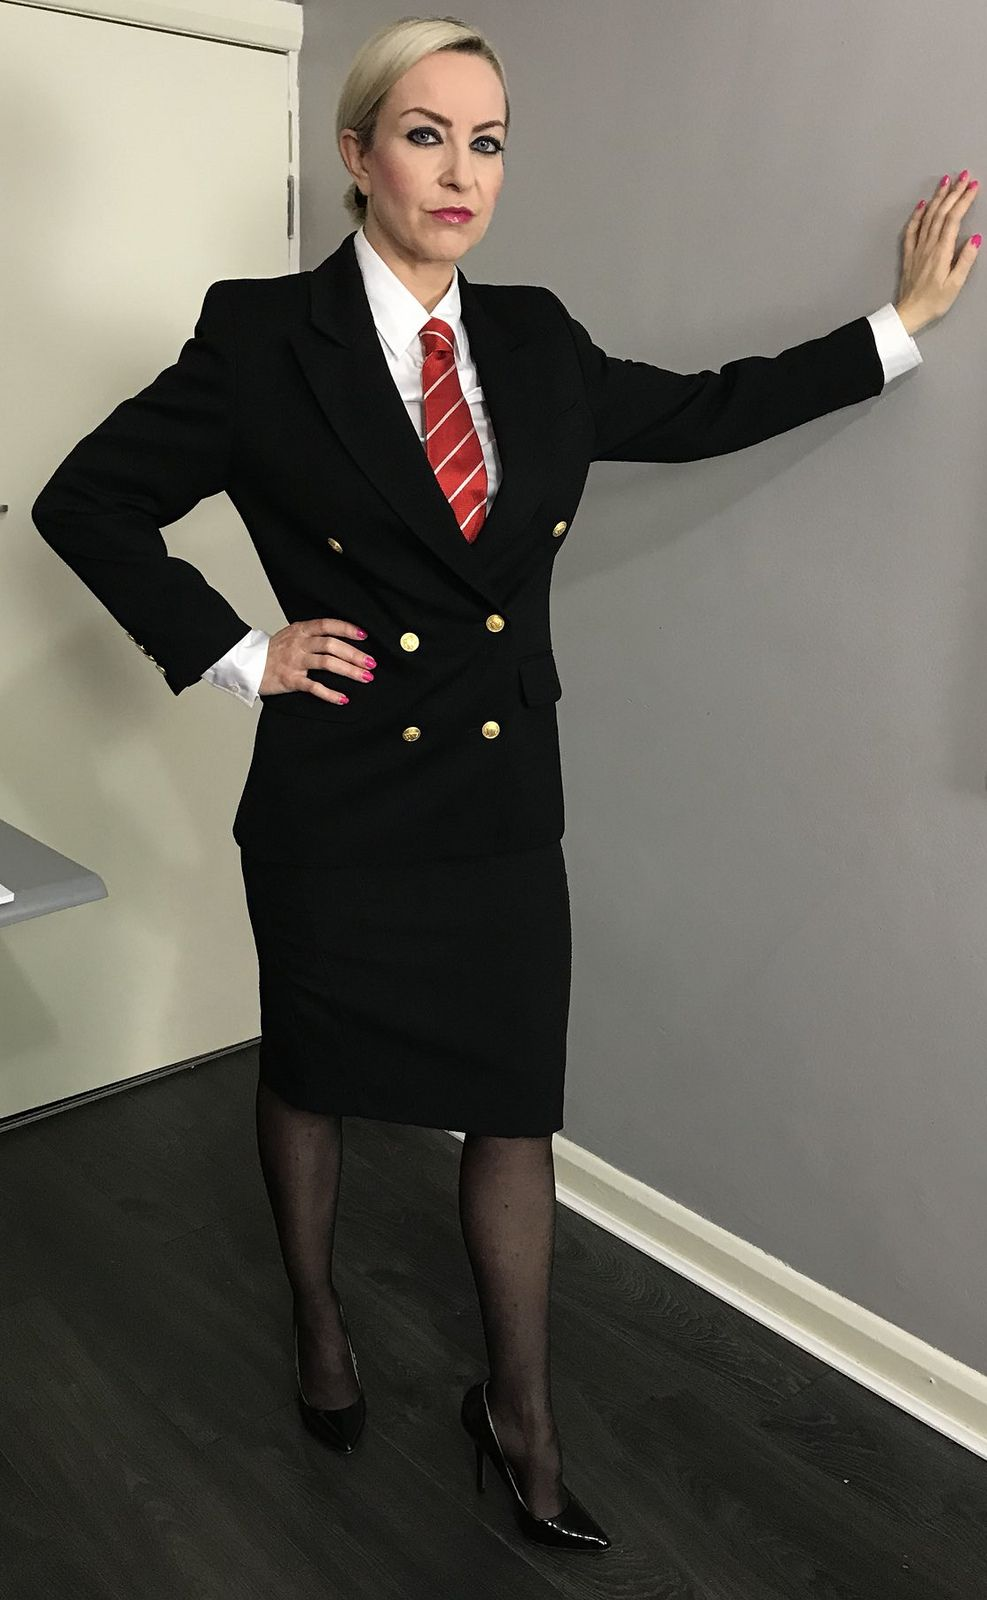 Untitled Suits For Women Women Wearing Ties